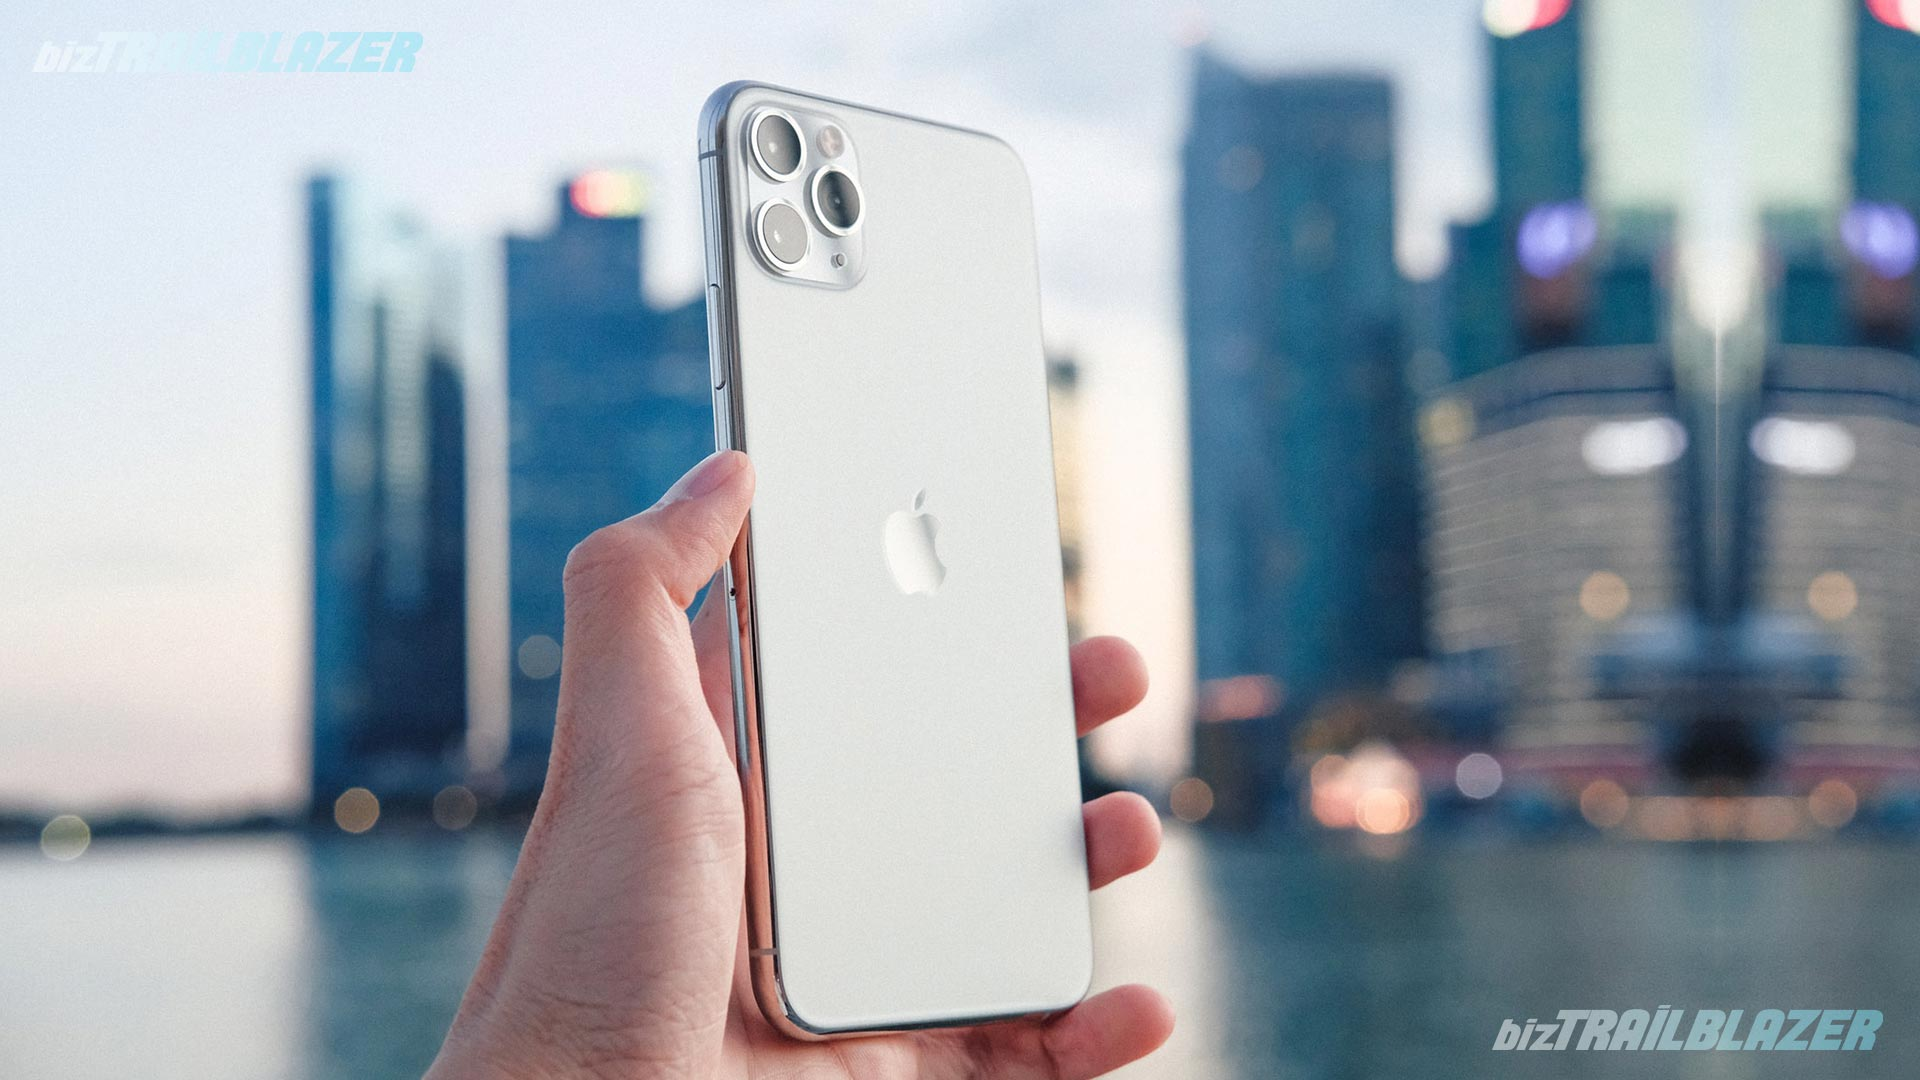 Apple-iPhone-12-will-be-Manufactured-in-India-BizTrailBlazer-Blog